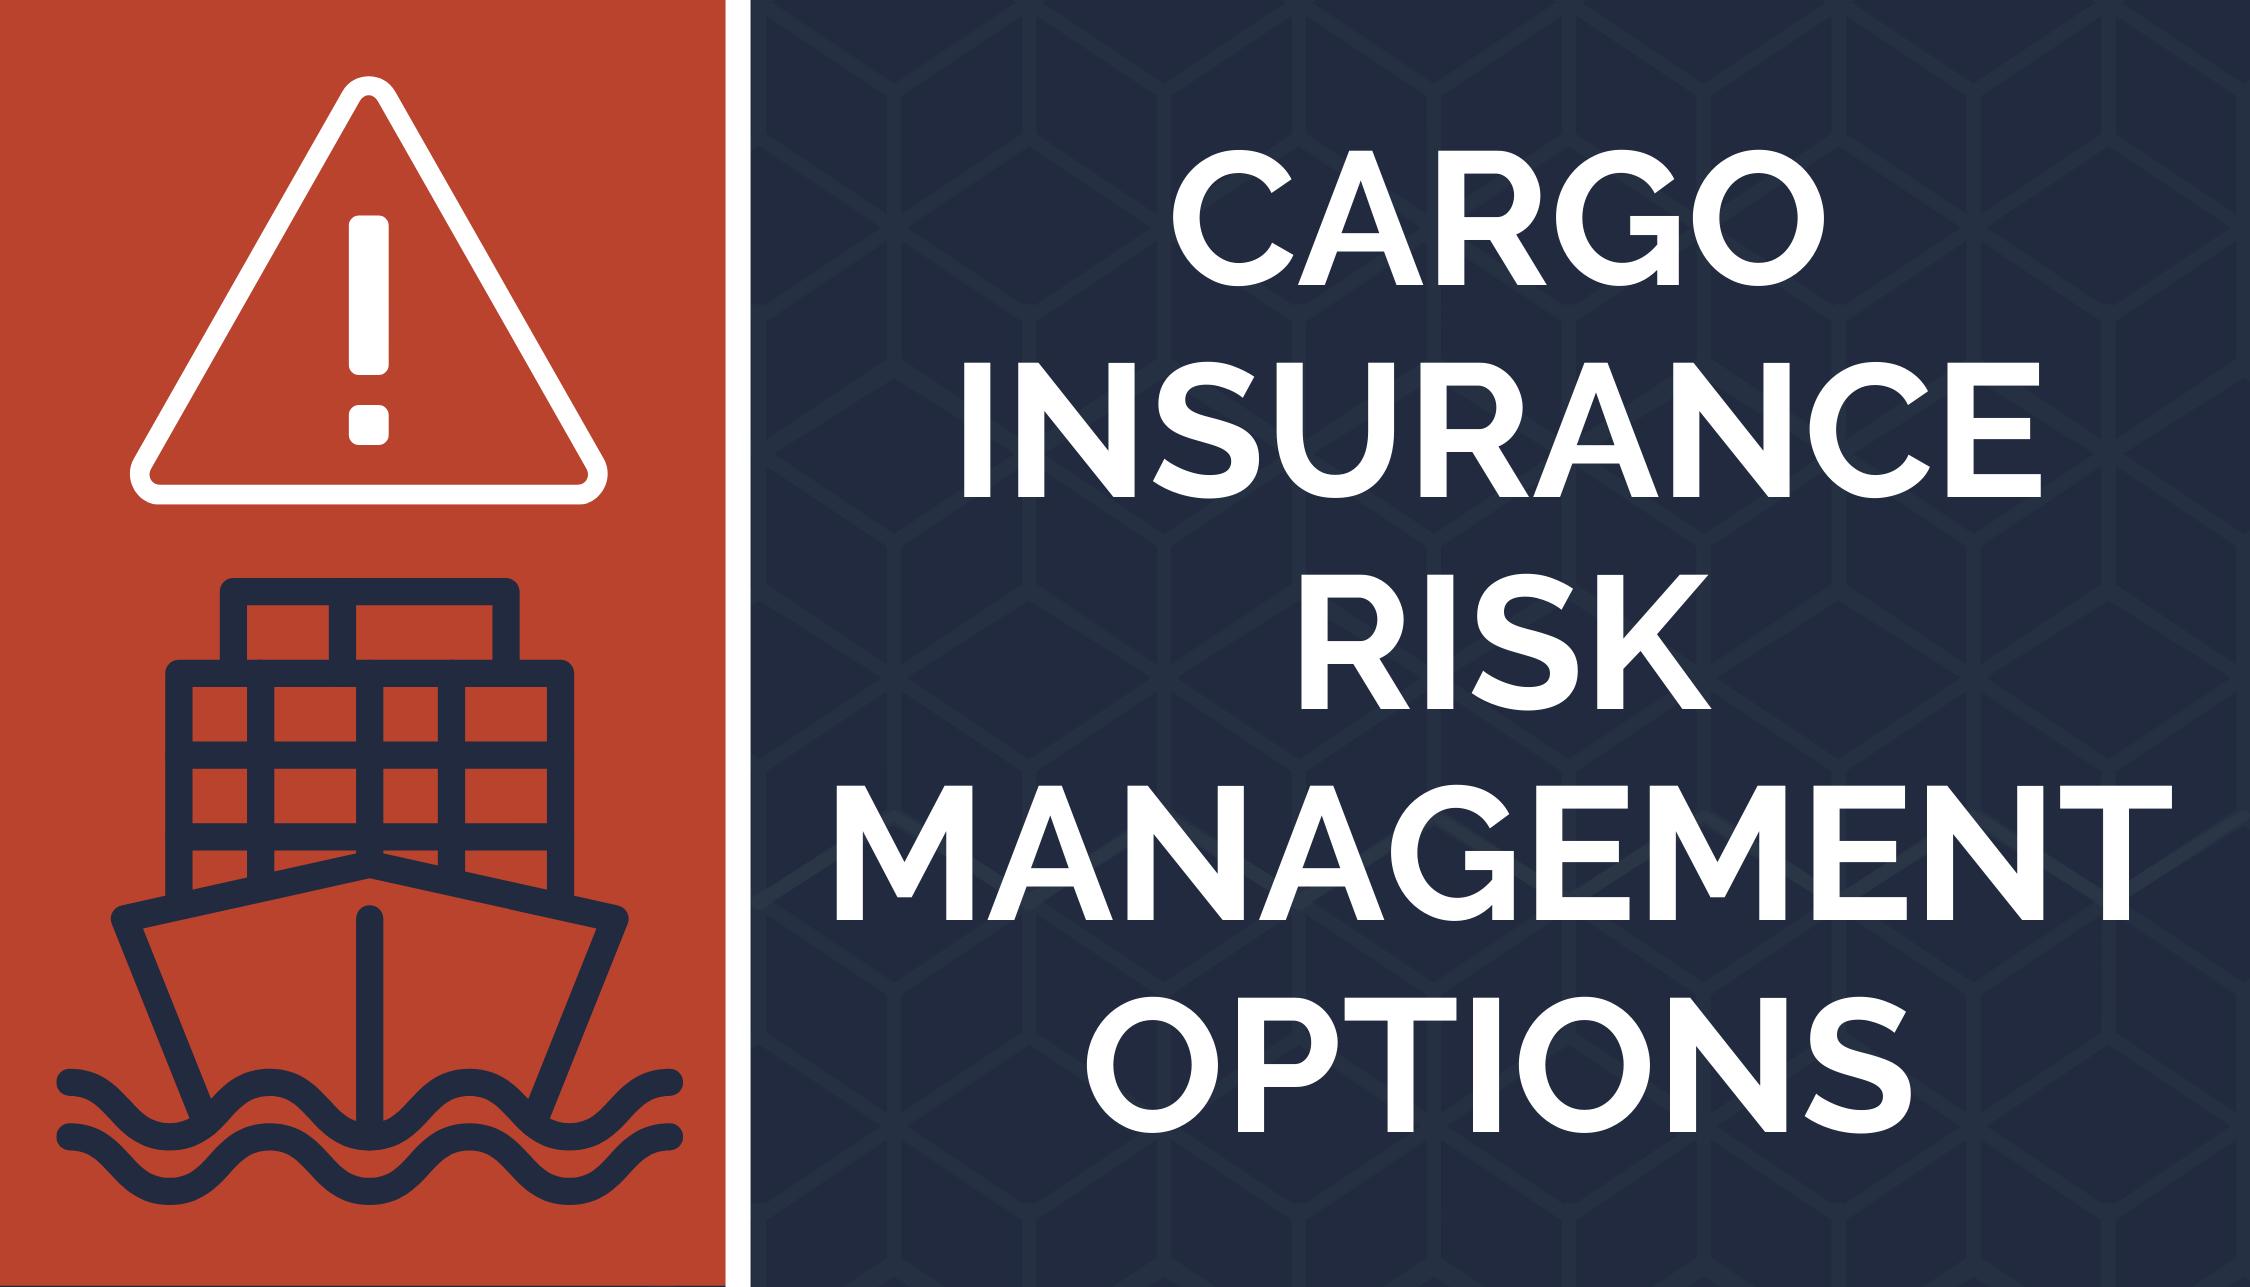 Cargo Insurance Risk Management Options